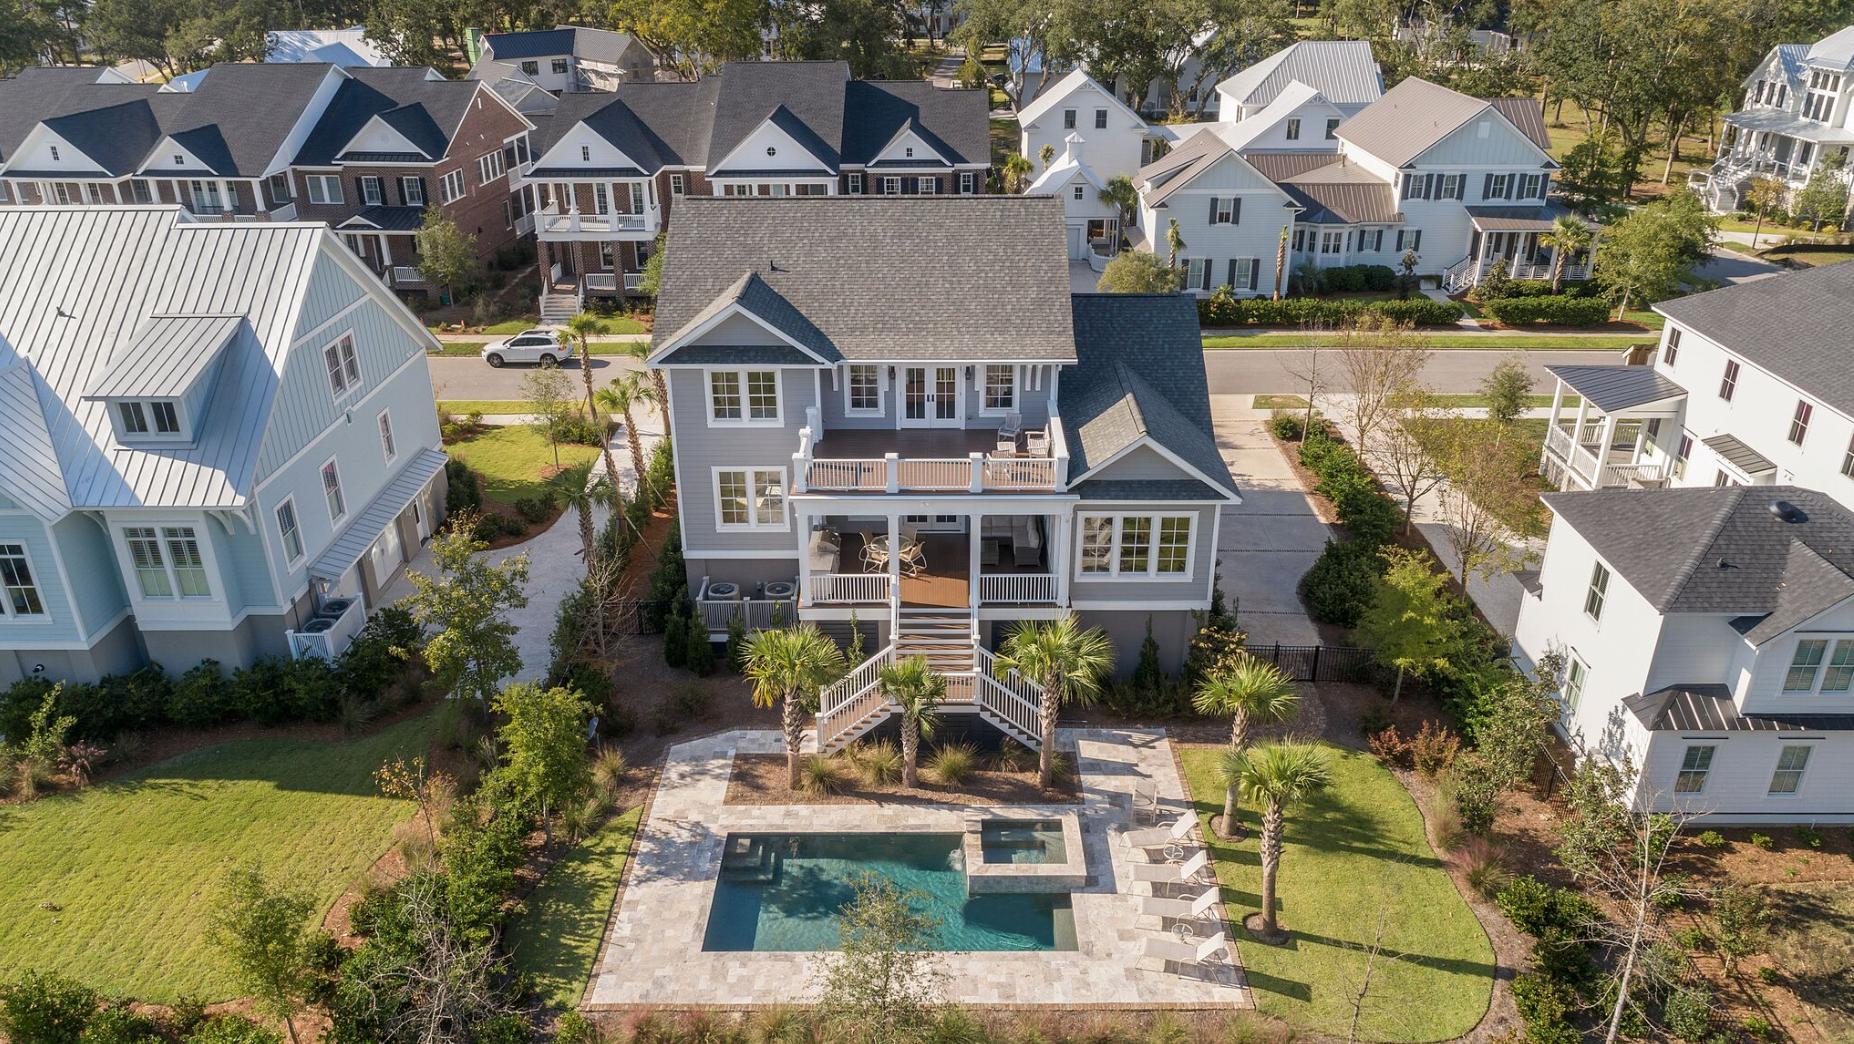 Daniel Island Homes For Sale - 107 Brailsford, Charleston, SC - 5